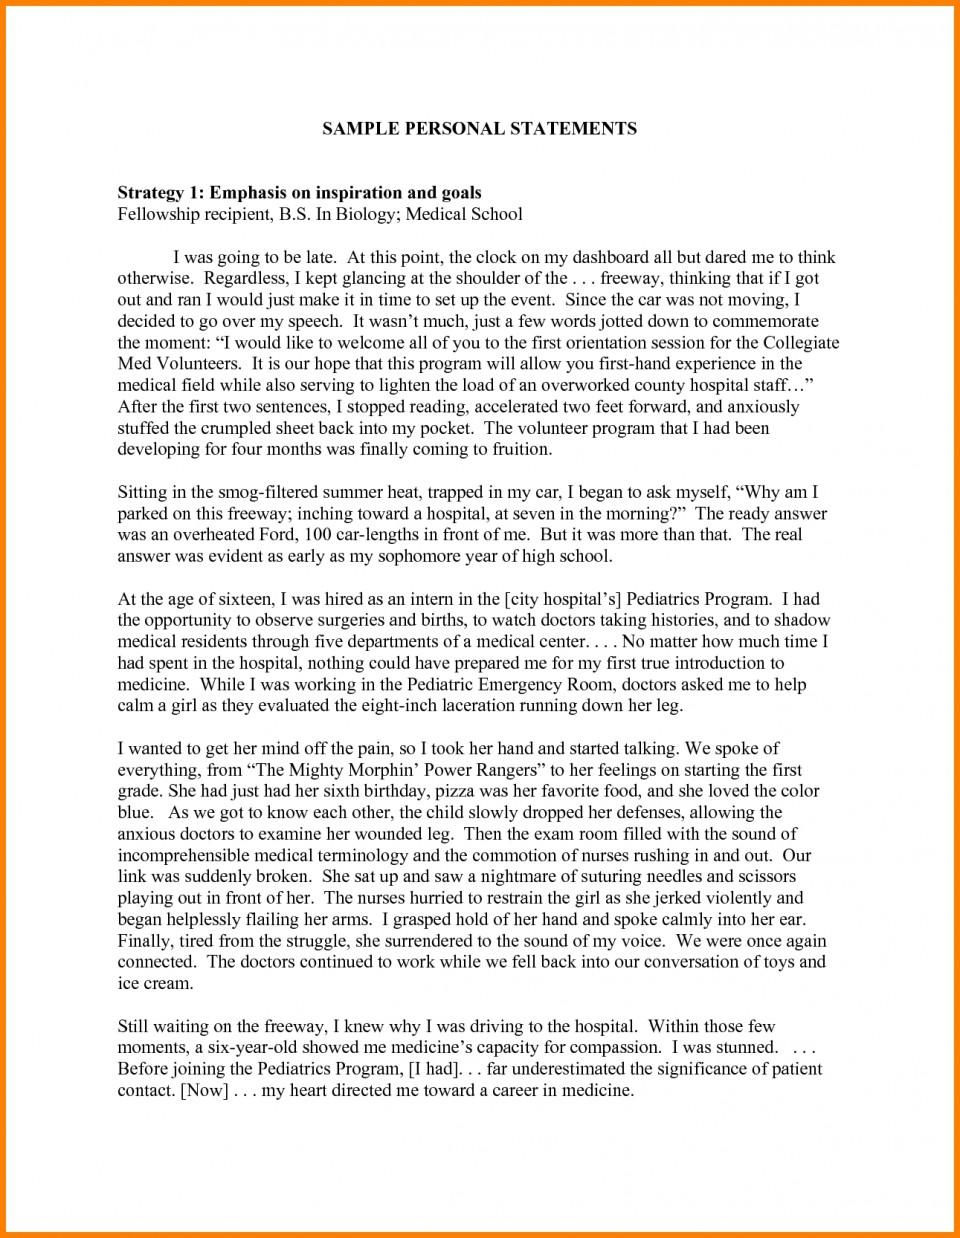 Sample appliation essay for nursing school